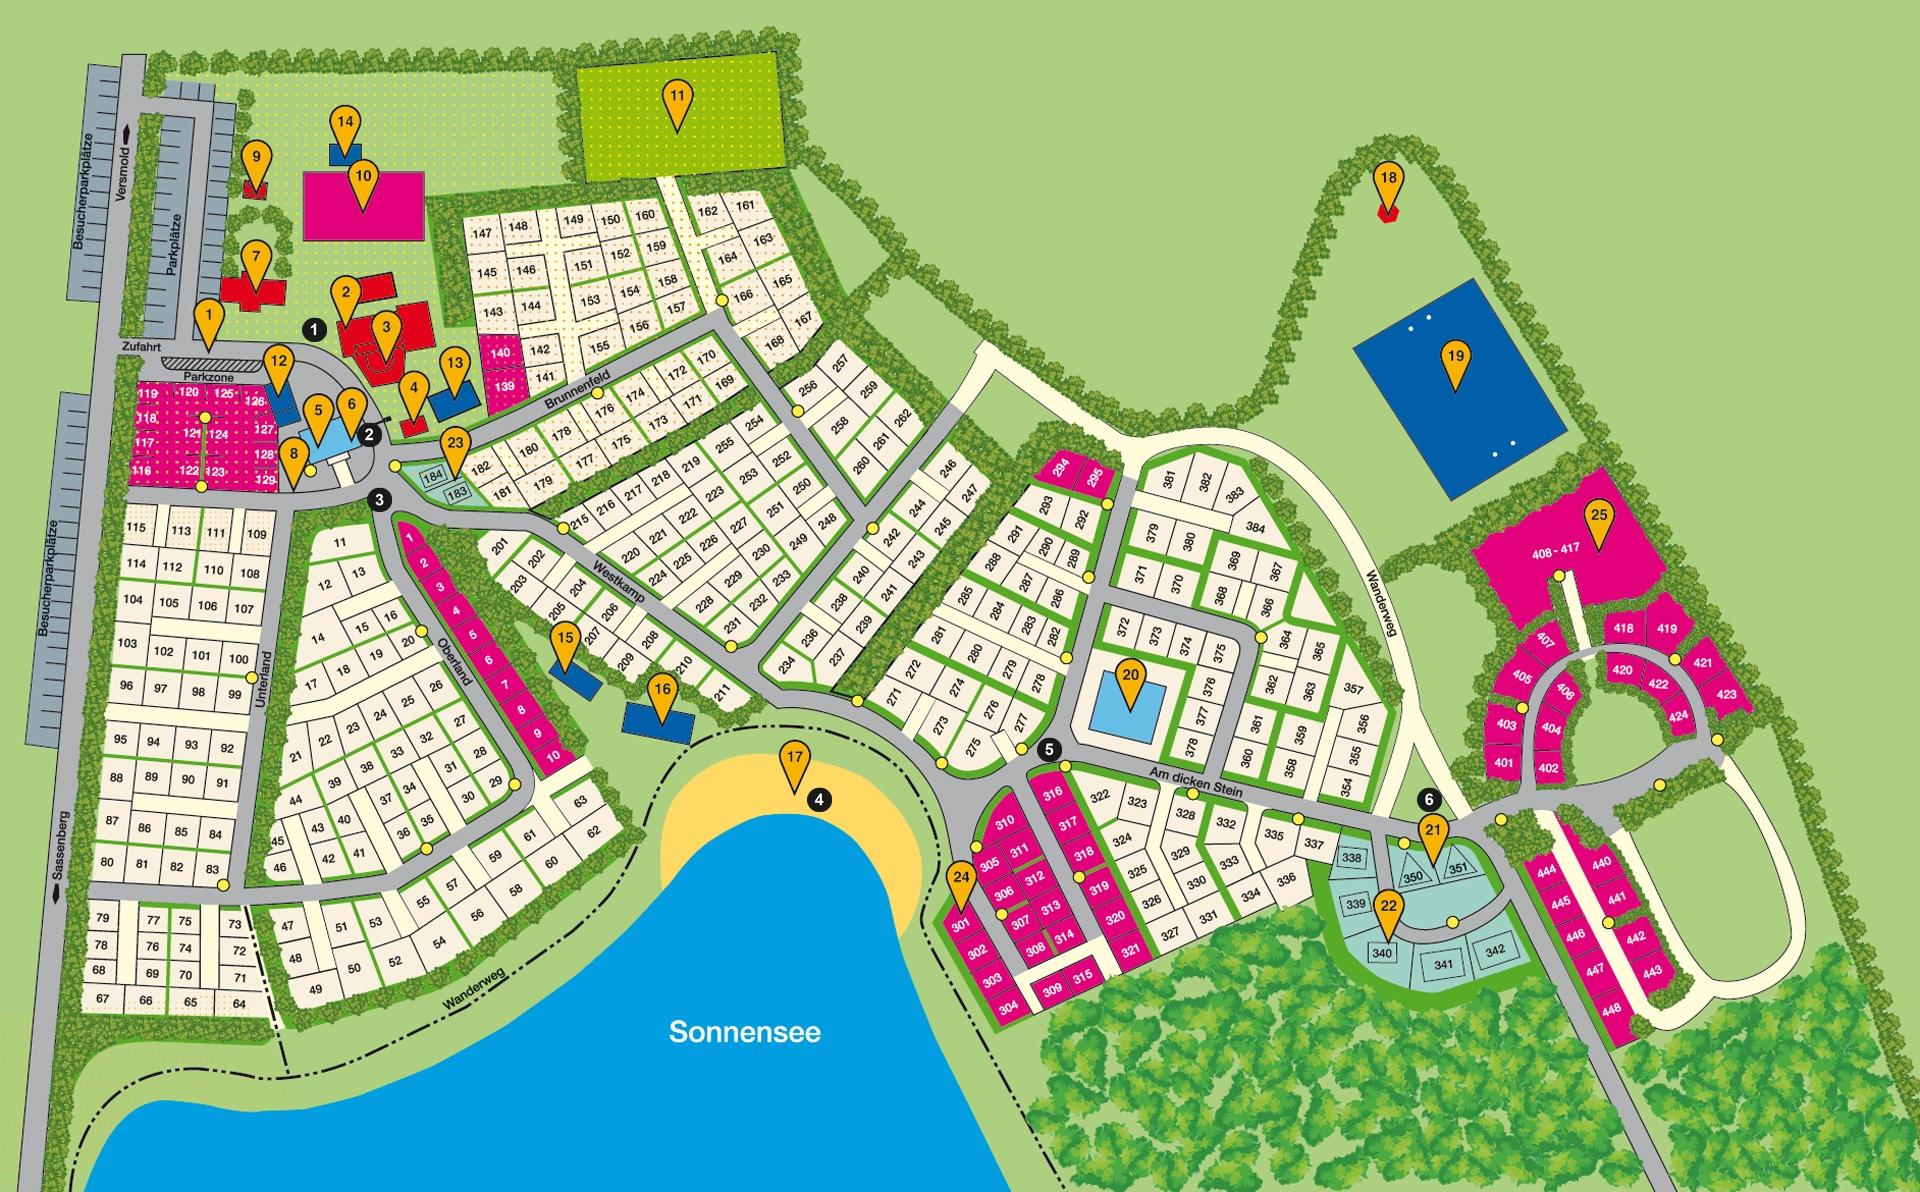 bersichtsplan campingpark sonnensee. Black Bedroom Furniture Sets. Home Design Ideas